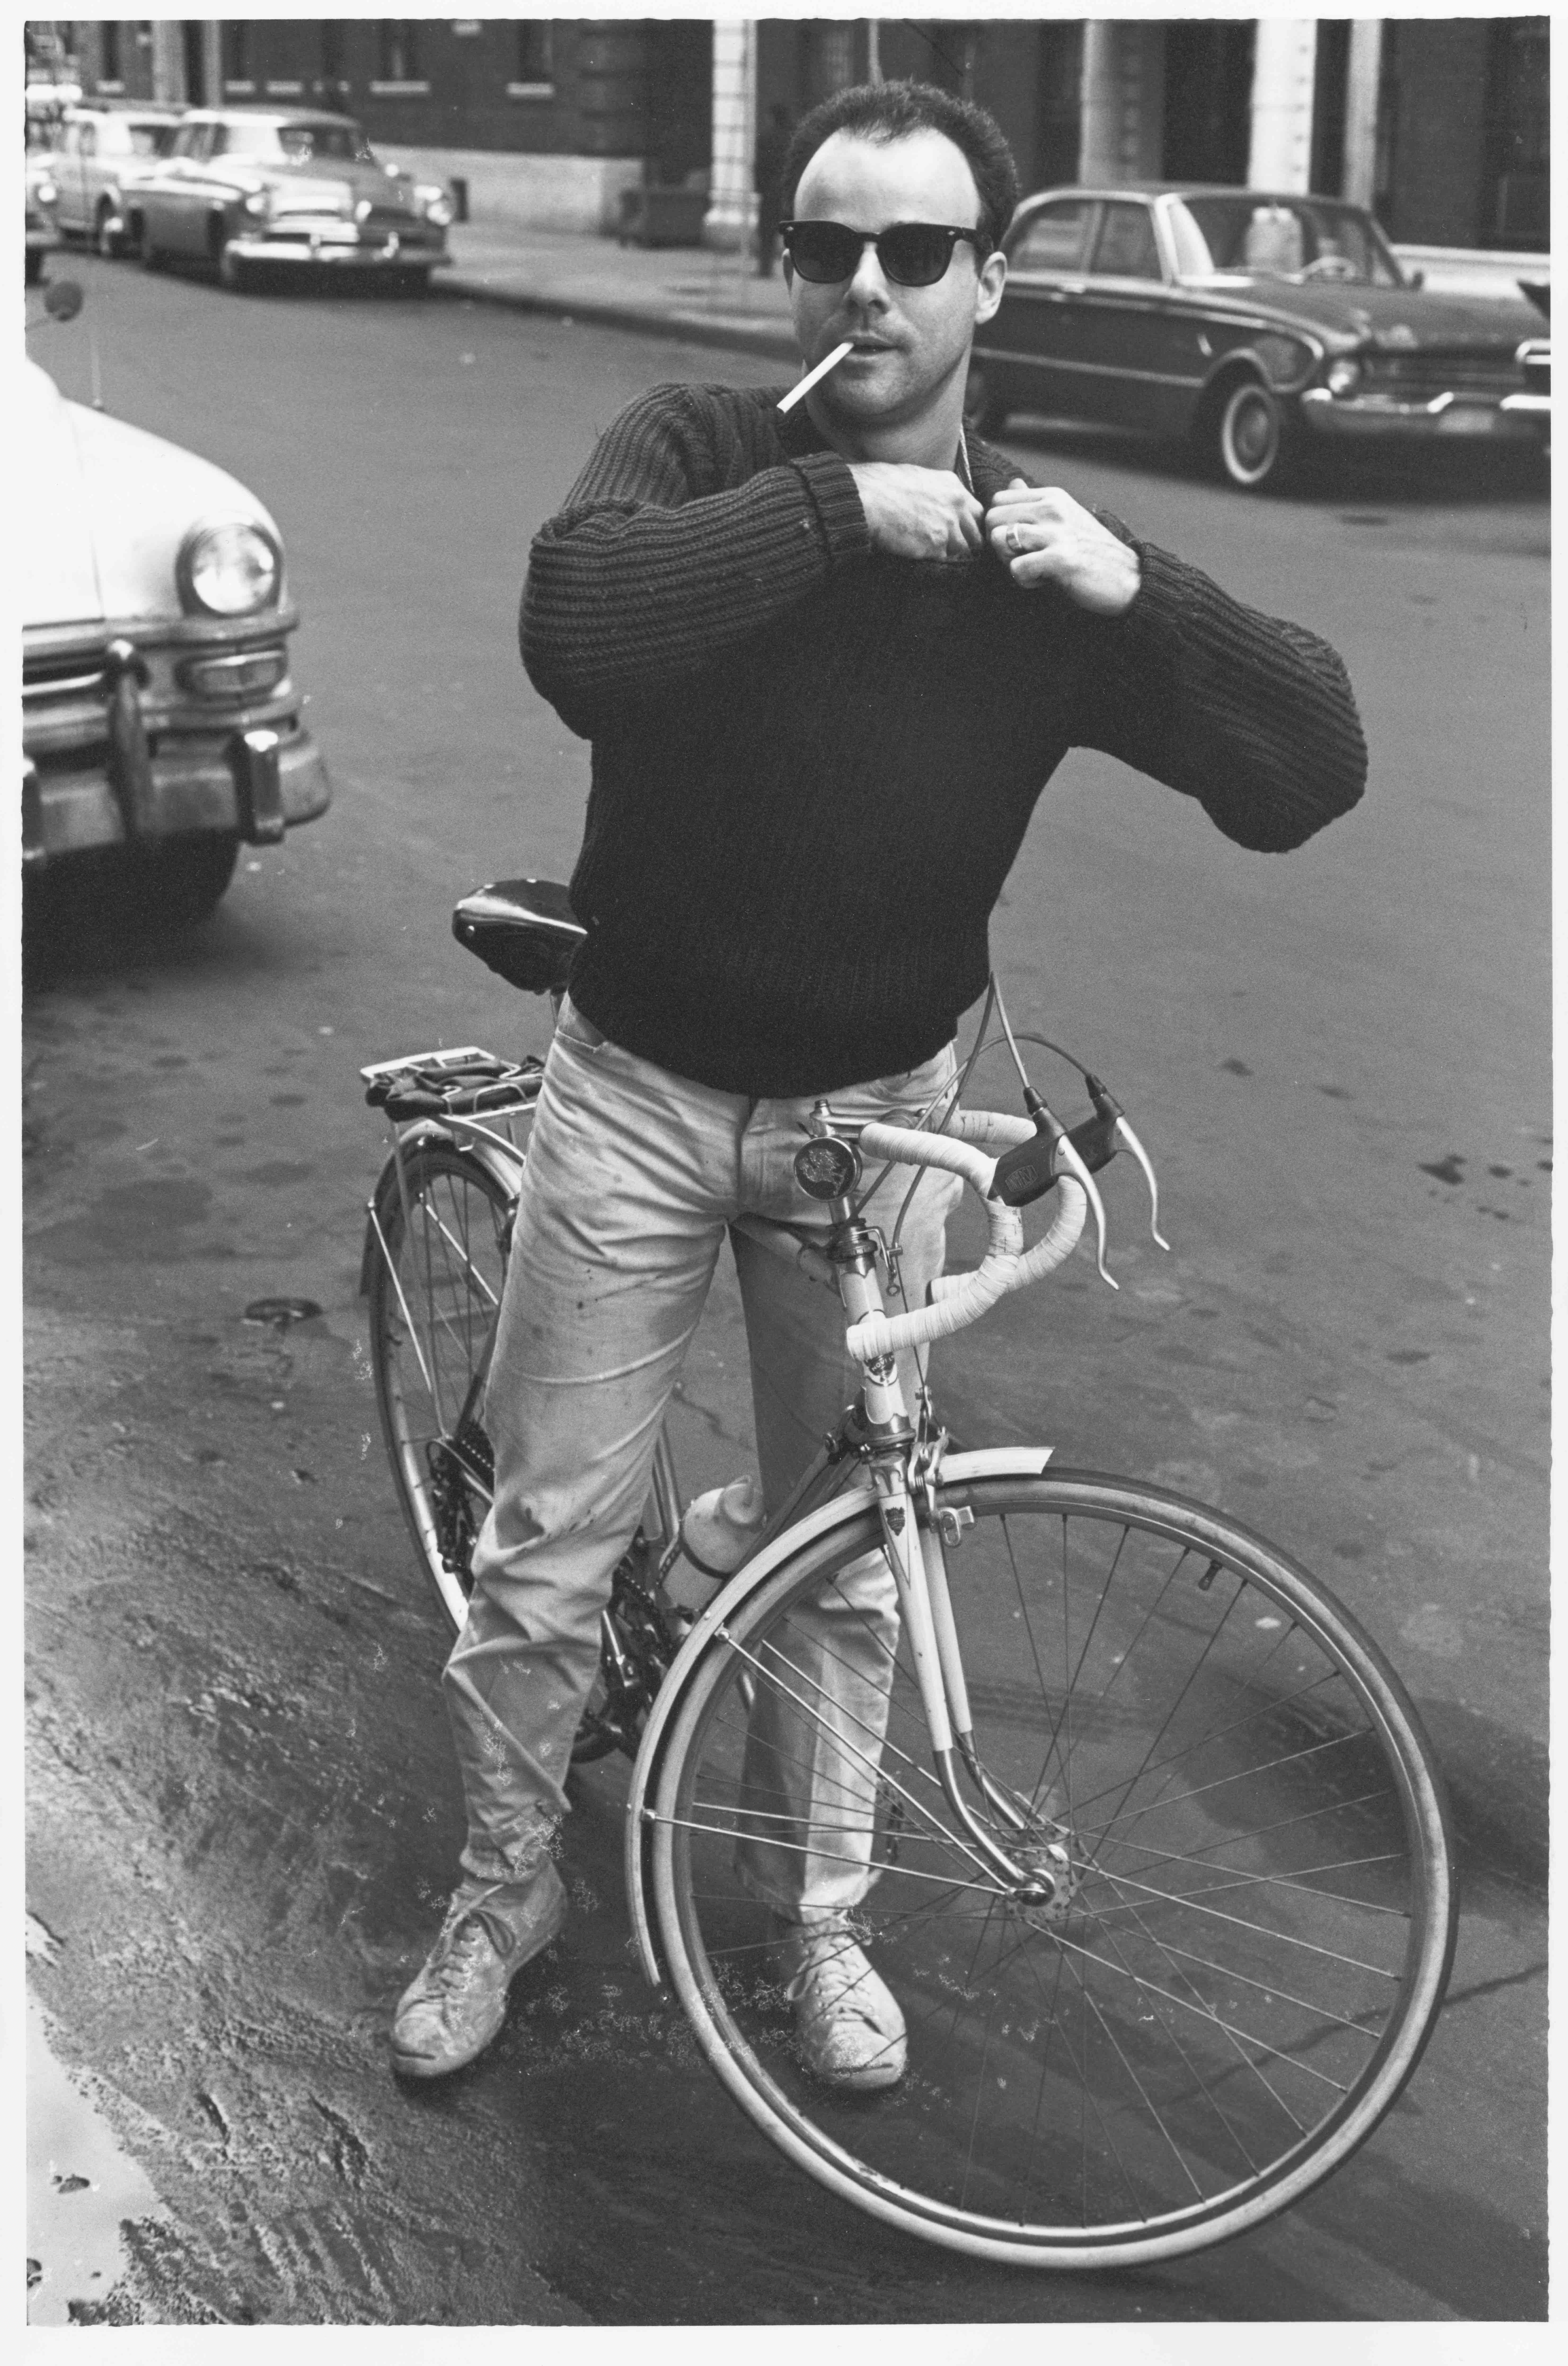 Mark Berghash on his bike, taking a break from his painting studio, 1964